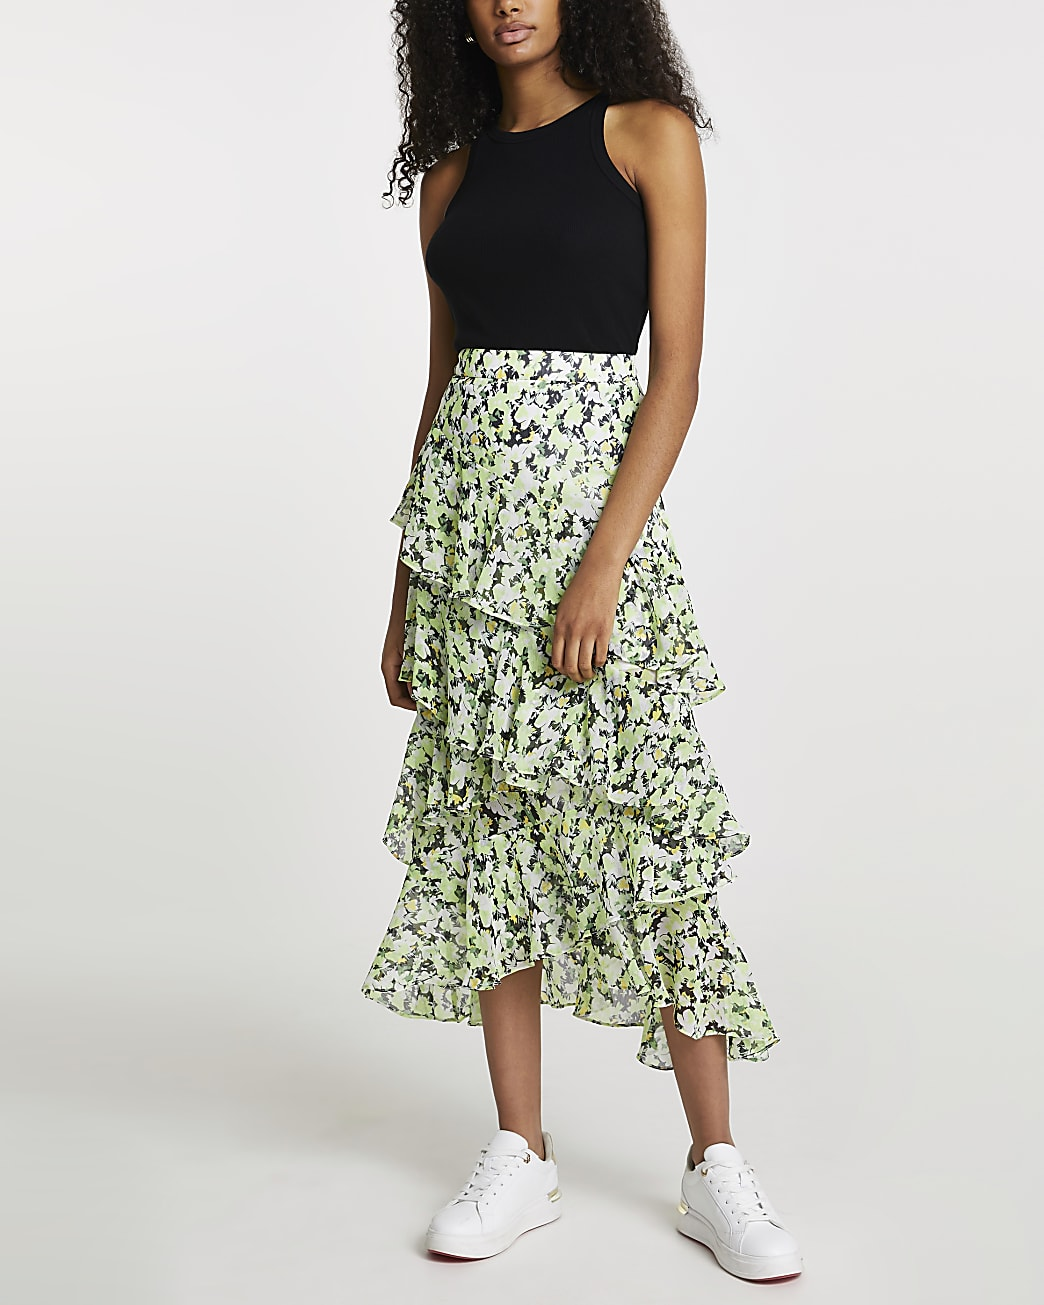 Green floral ruffle maxi skirt